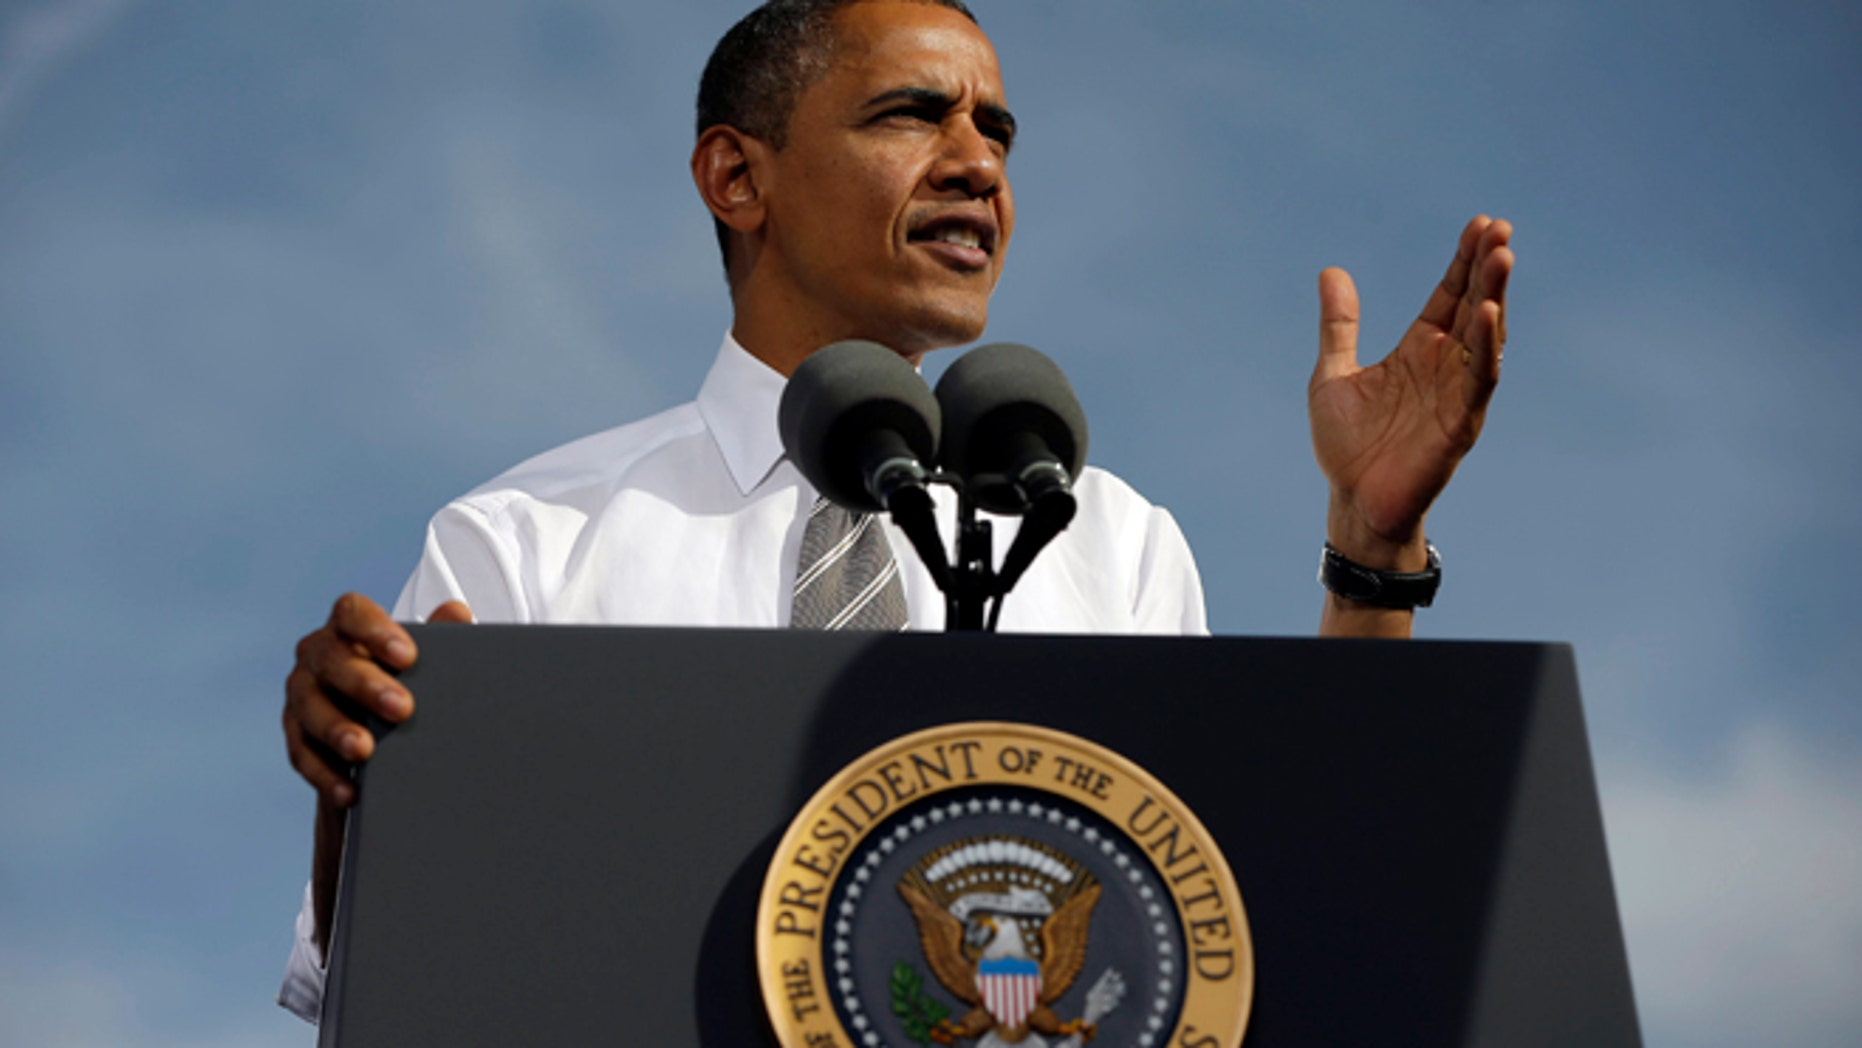 FILE: Nov. 1, 2012: President Obama speaks at Cheyenne Sports Complex in Las Vegas.